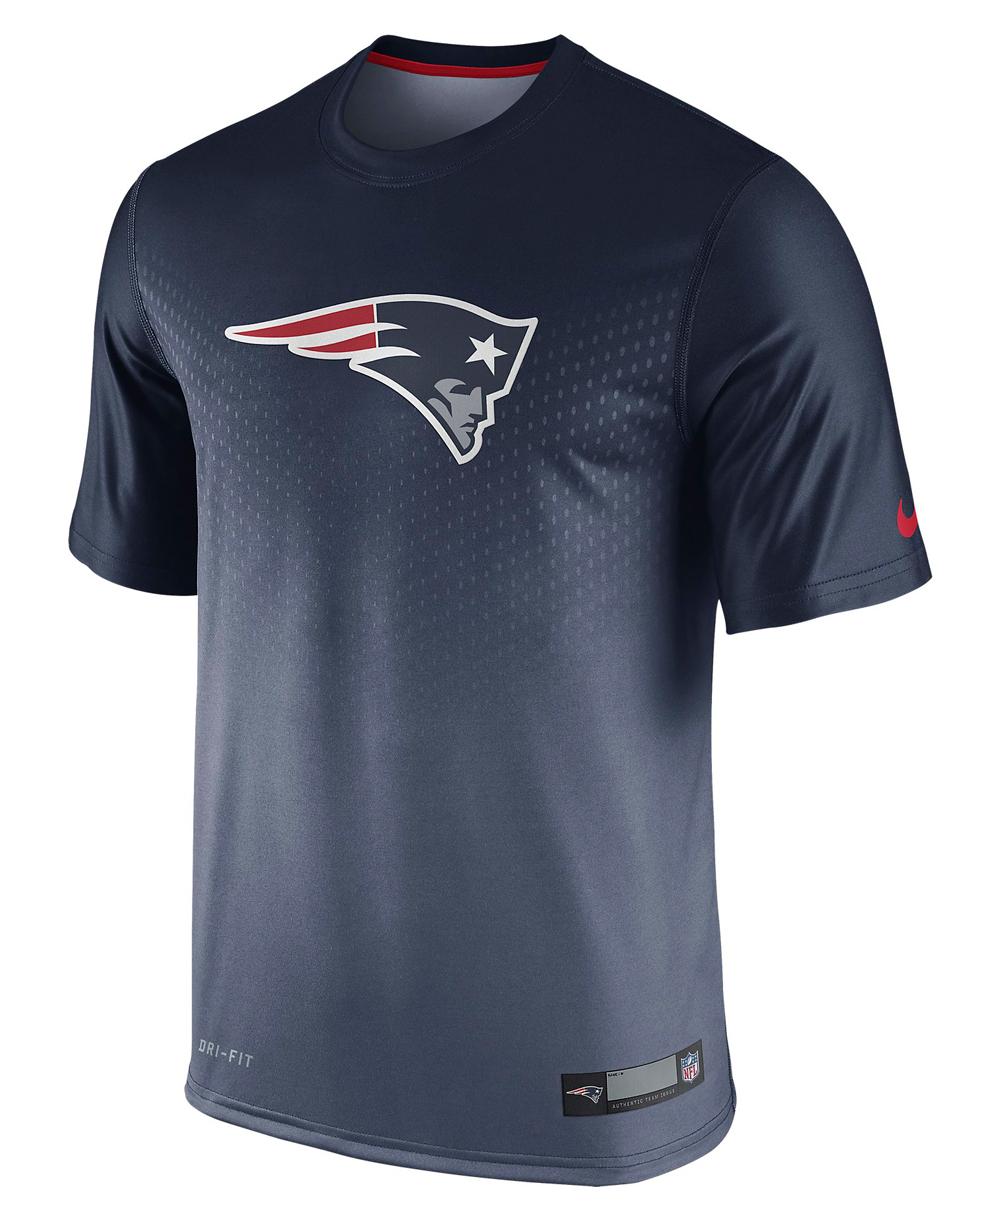 Nike Men s Short Sleeve T-Shirt Legend Sideline NFL New England Pat... 9c148d79f